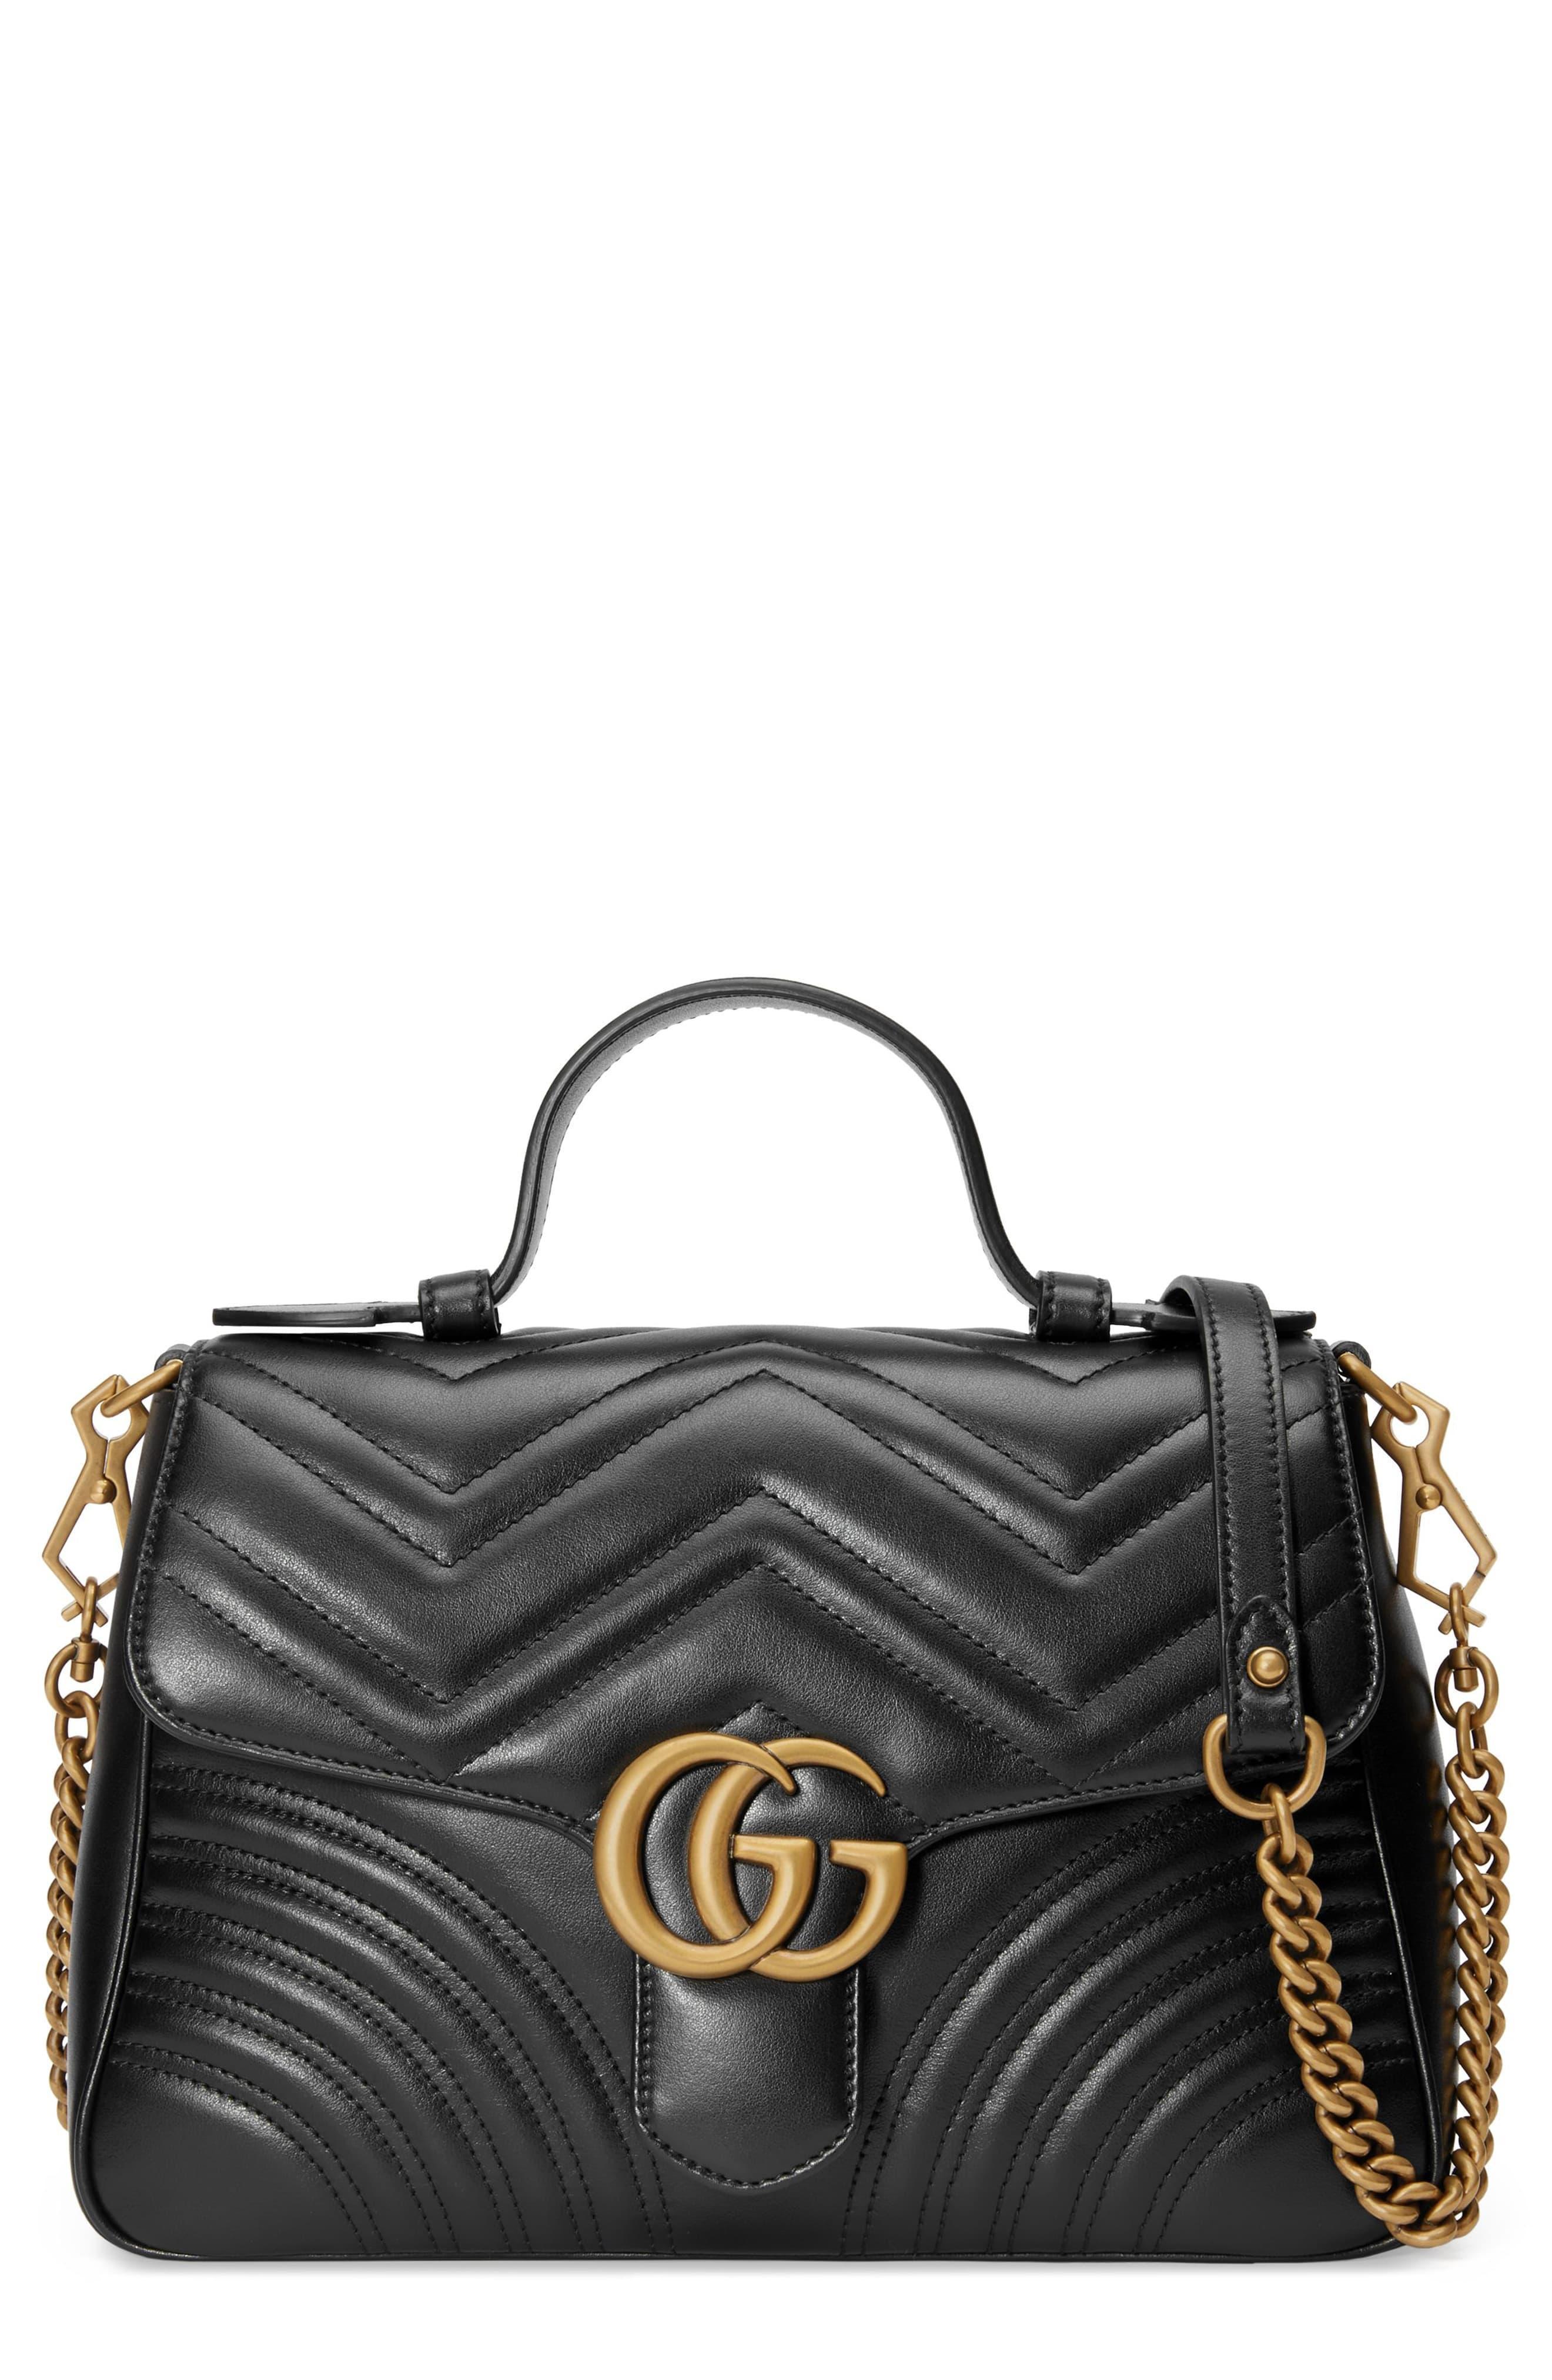 Gucci Small Gg Marmont 2.0 Matelasse Leather Camera Bag